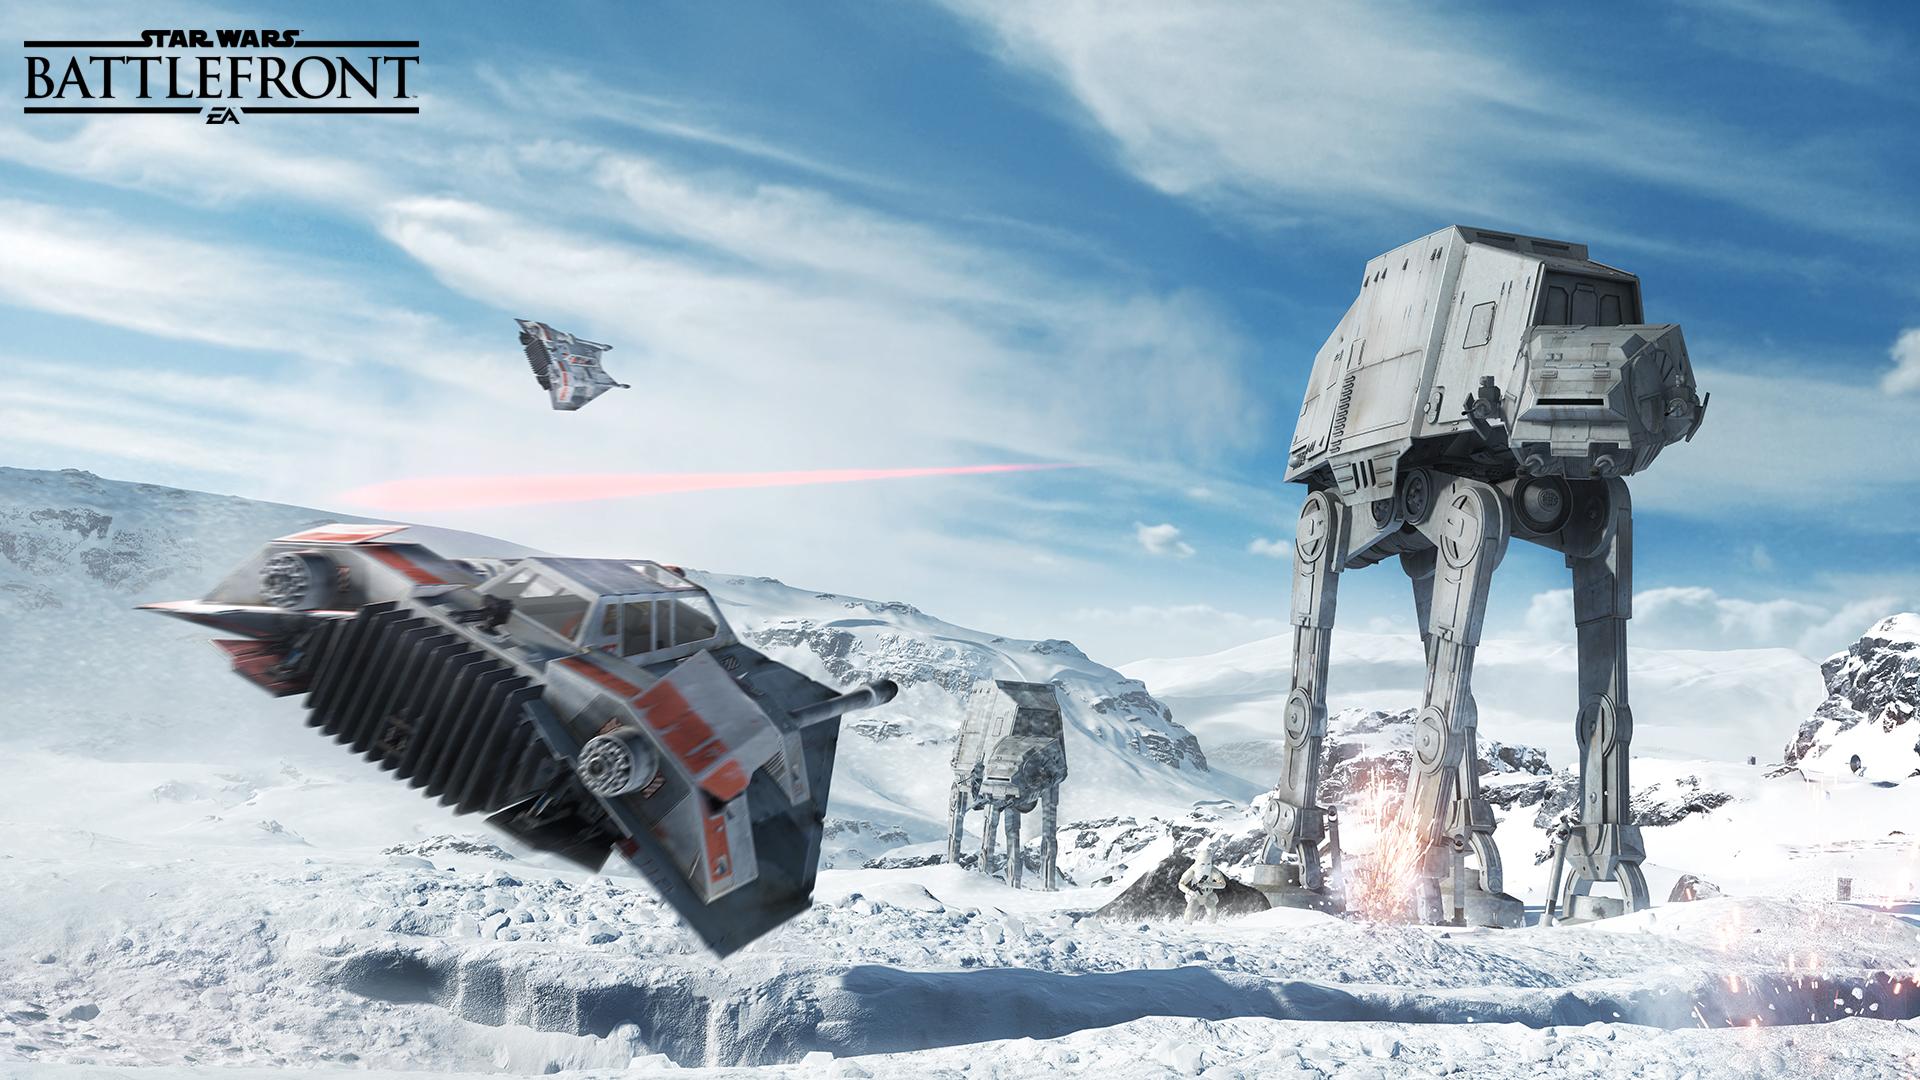 Image Credit: SXSW & Star Wars Battlefront